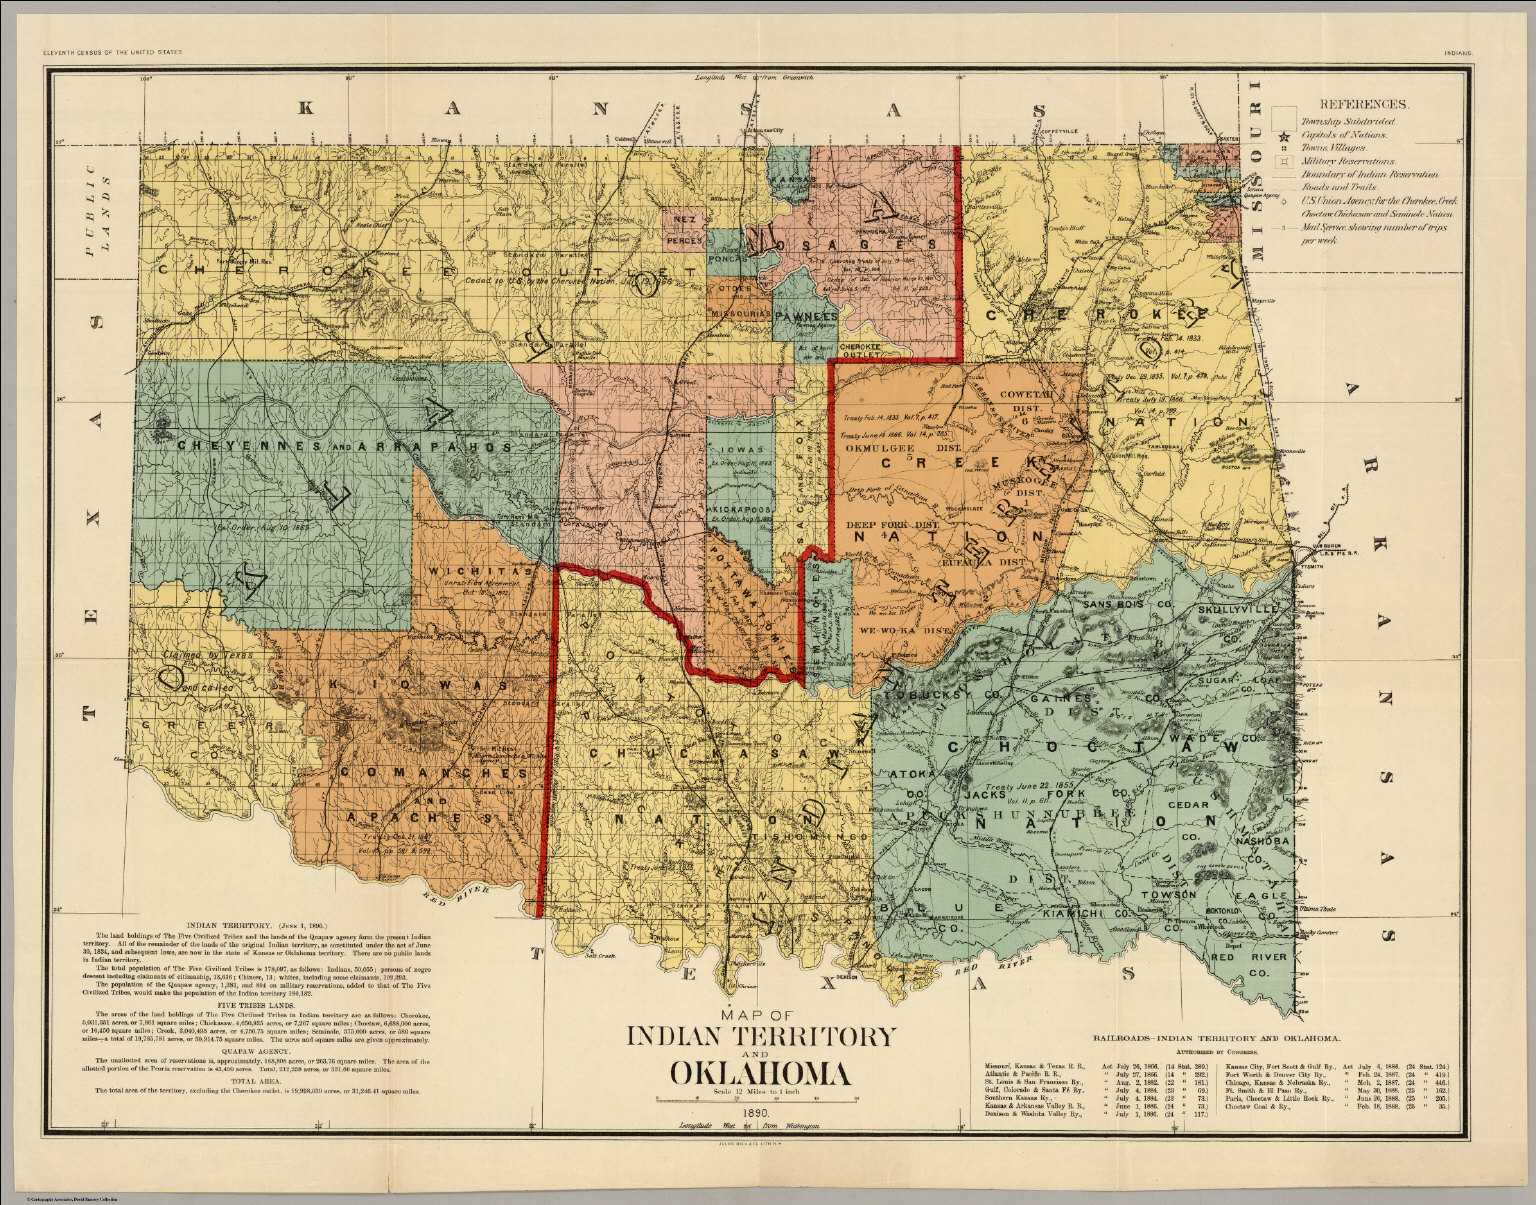 oklahoma indian territory1890 21